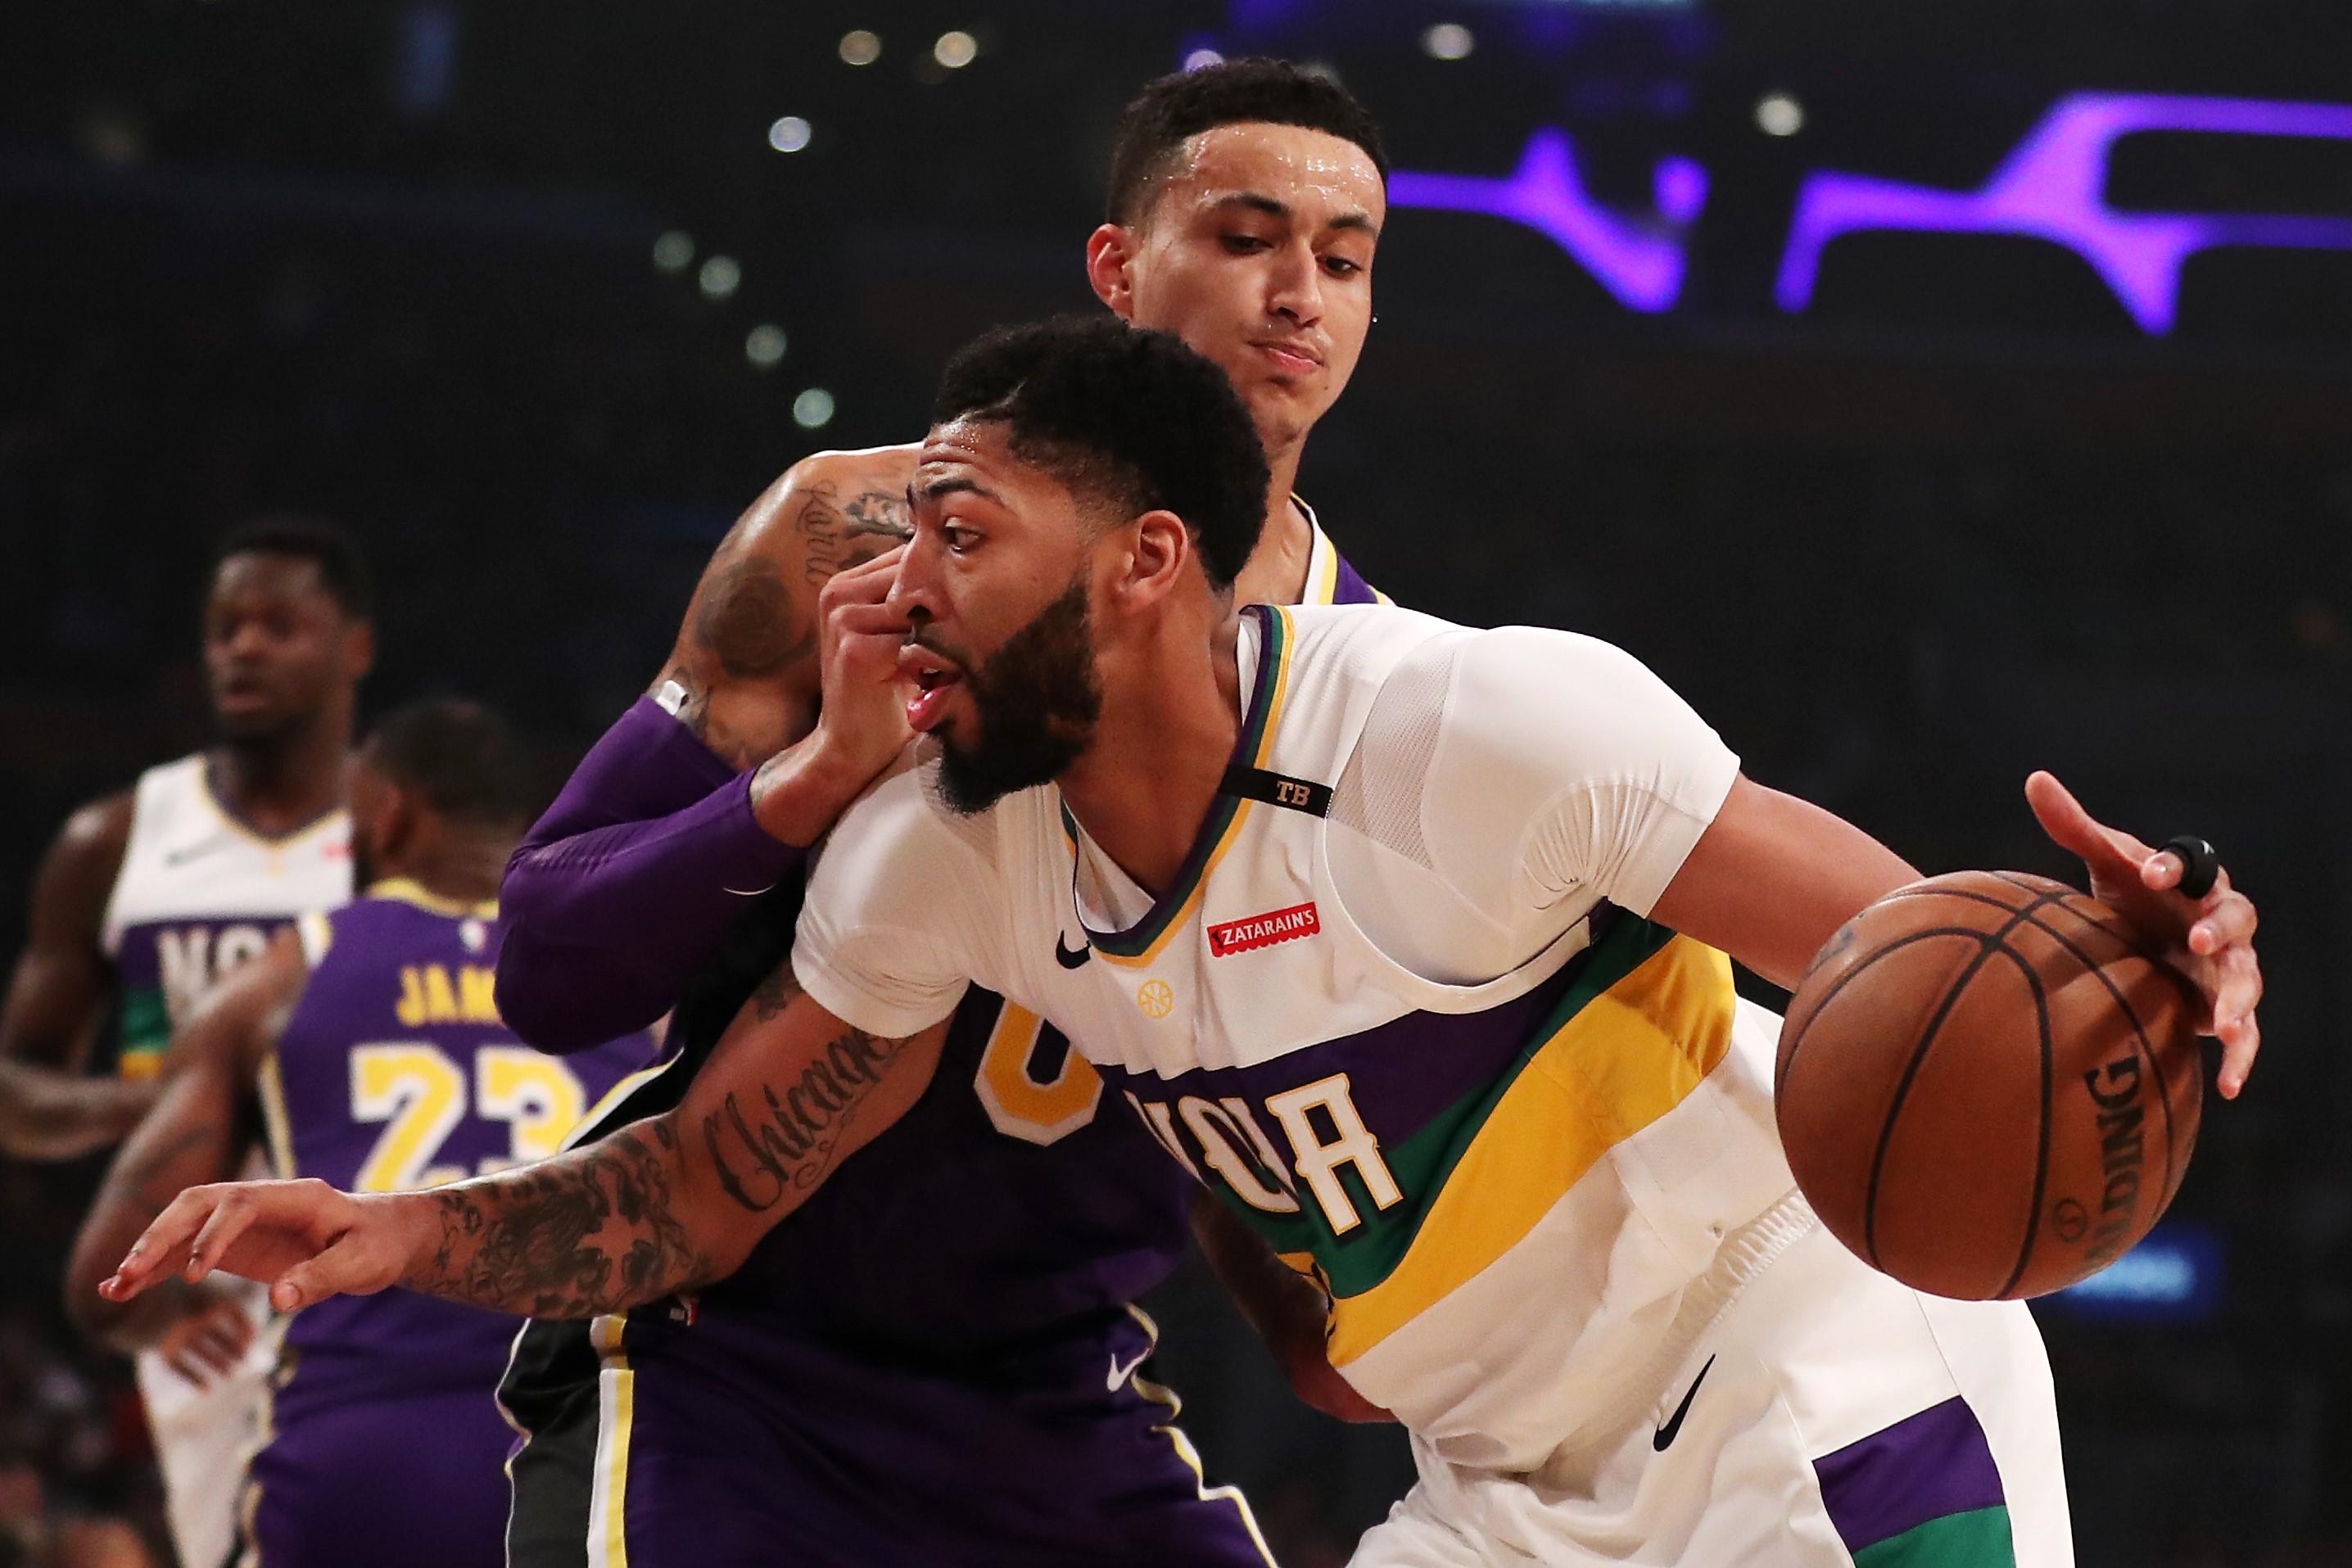 Anthony Davis (New Orleans Pelicans) vs Kyle Kuzma (Los Angeles Lakers)